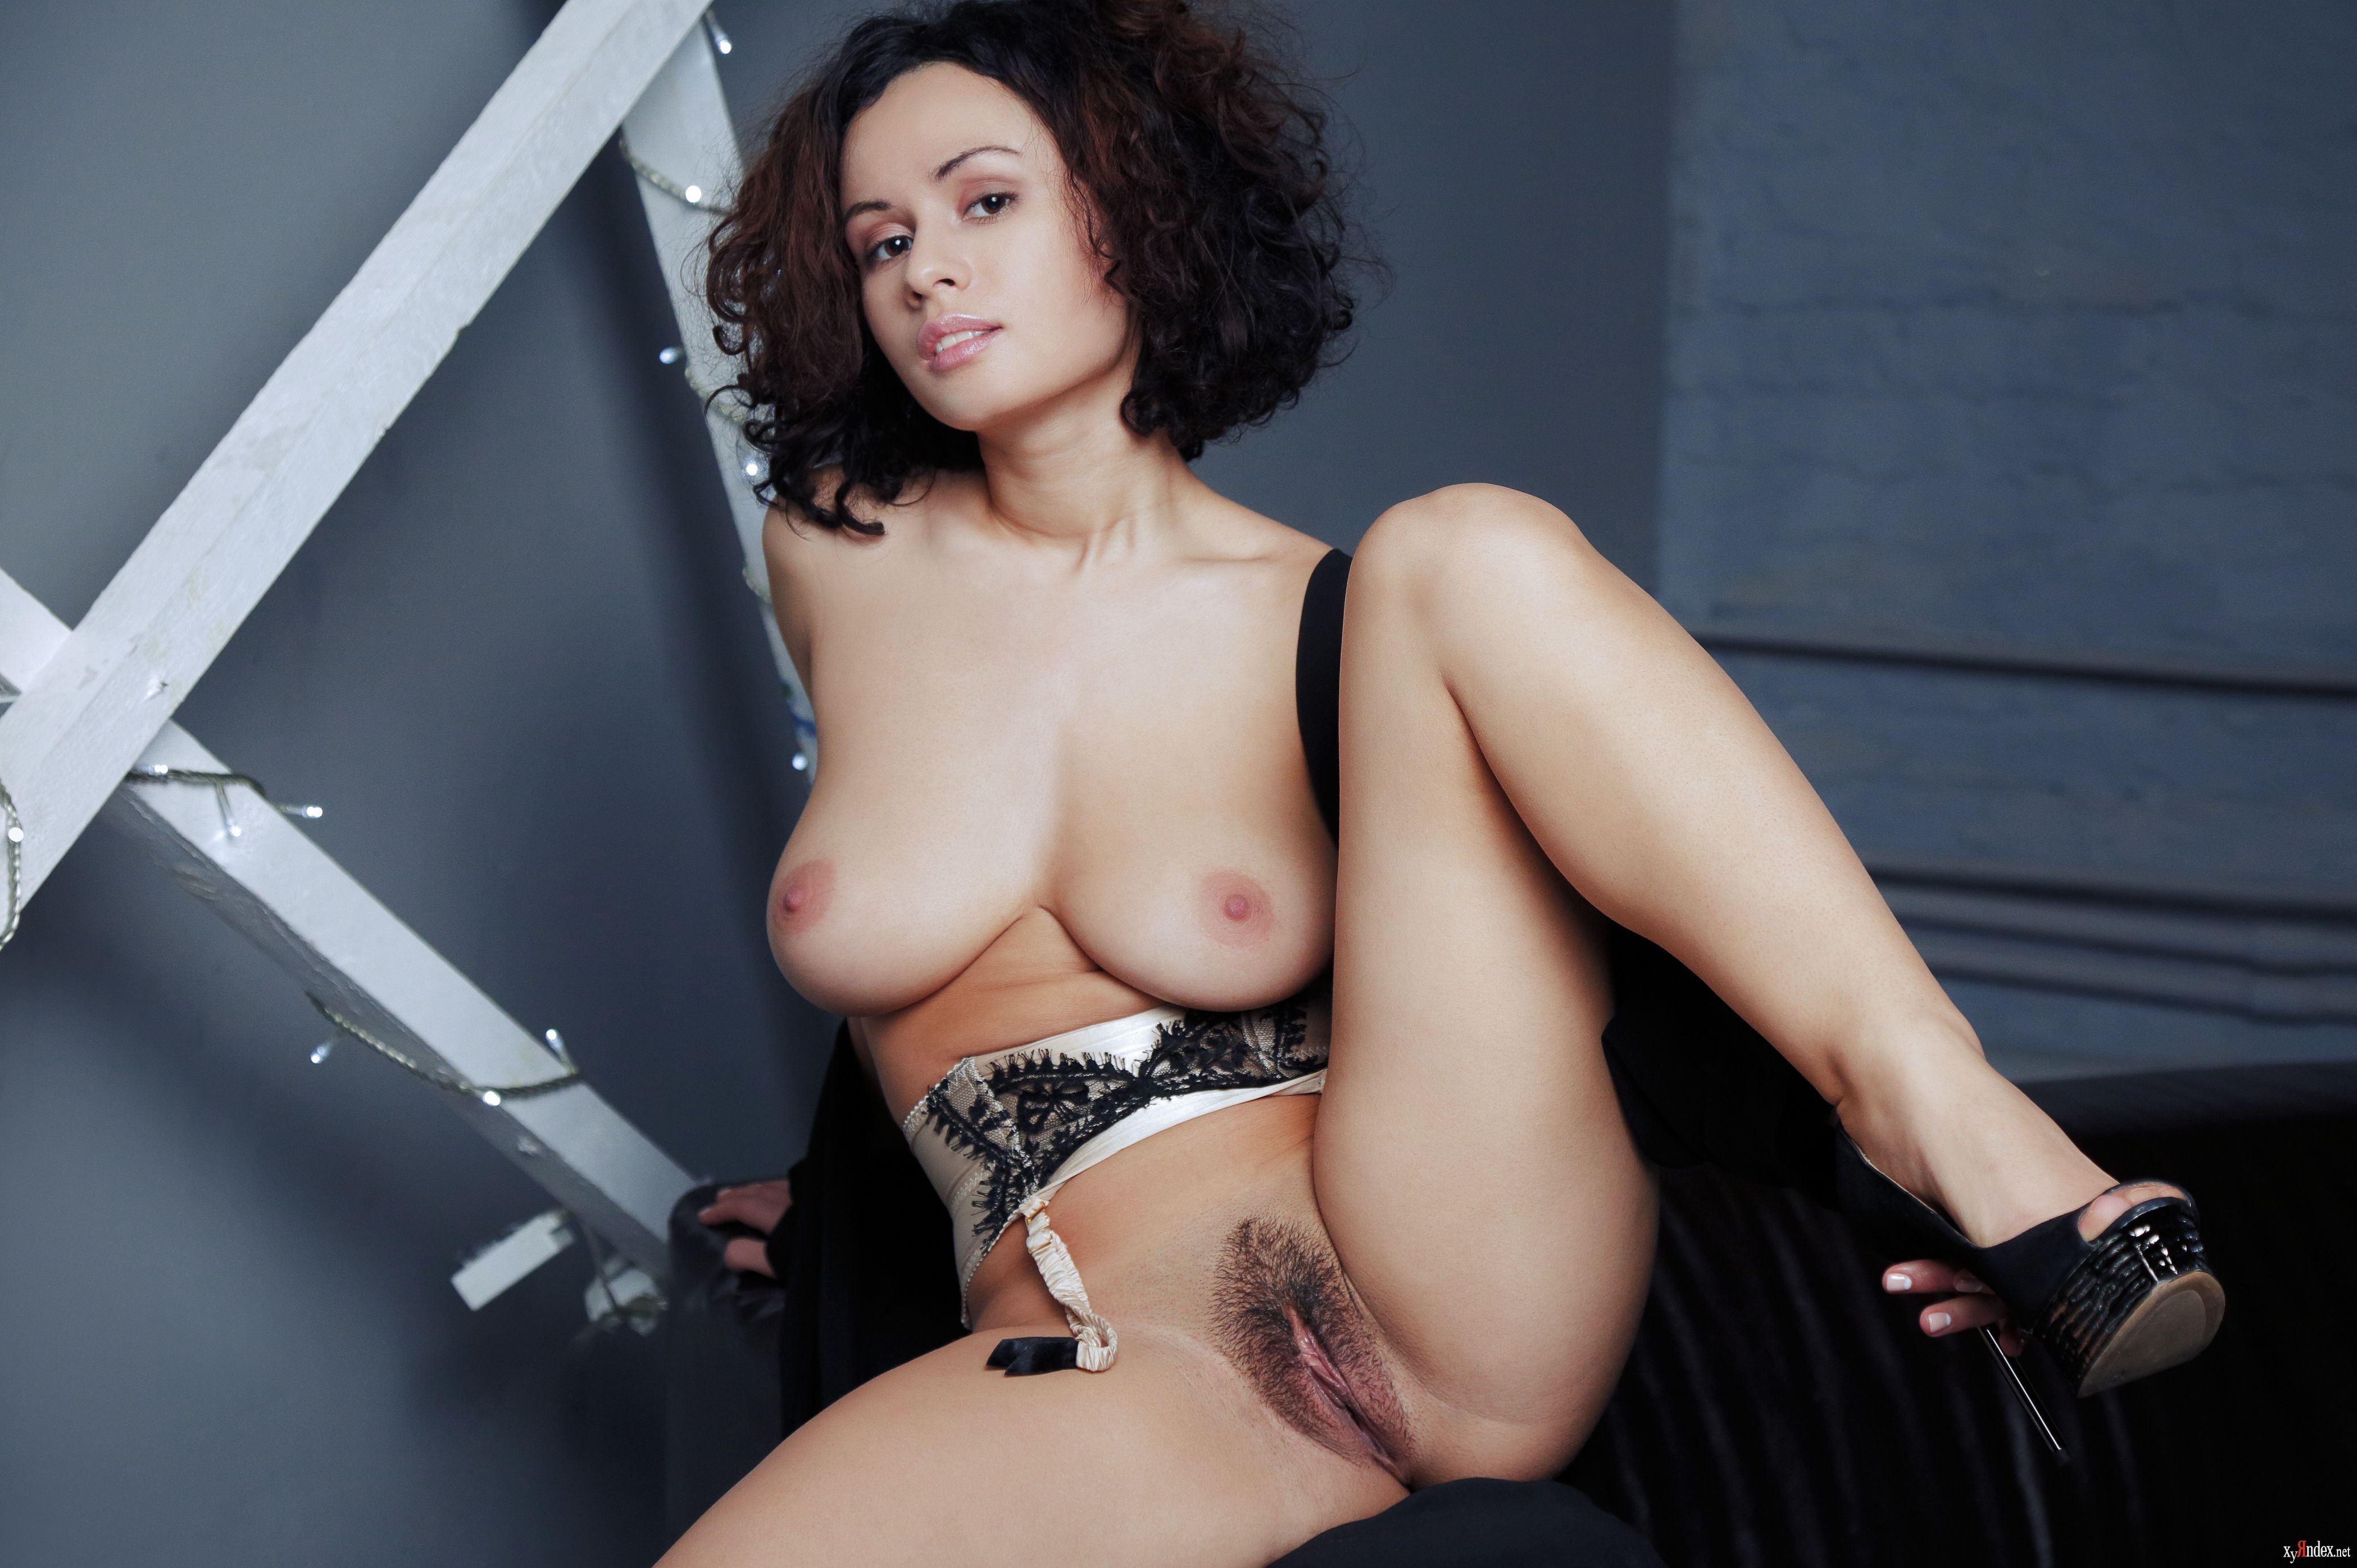 Pammie Lee Total Bliss Sexy Latex Wallpaper Istripper Virtual Striptease On The Desktop Pornstar Girls